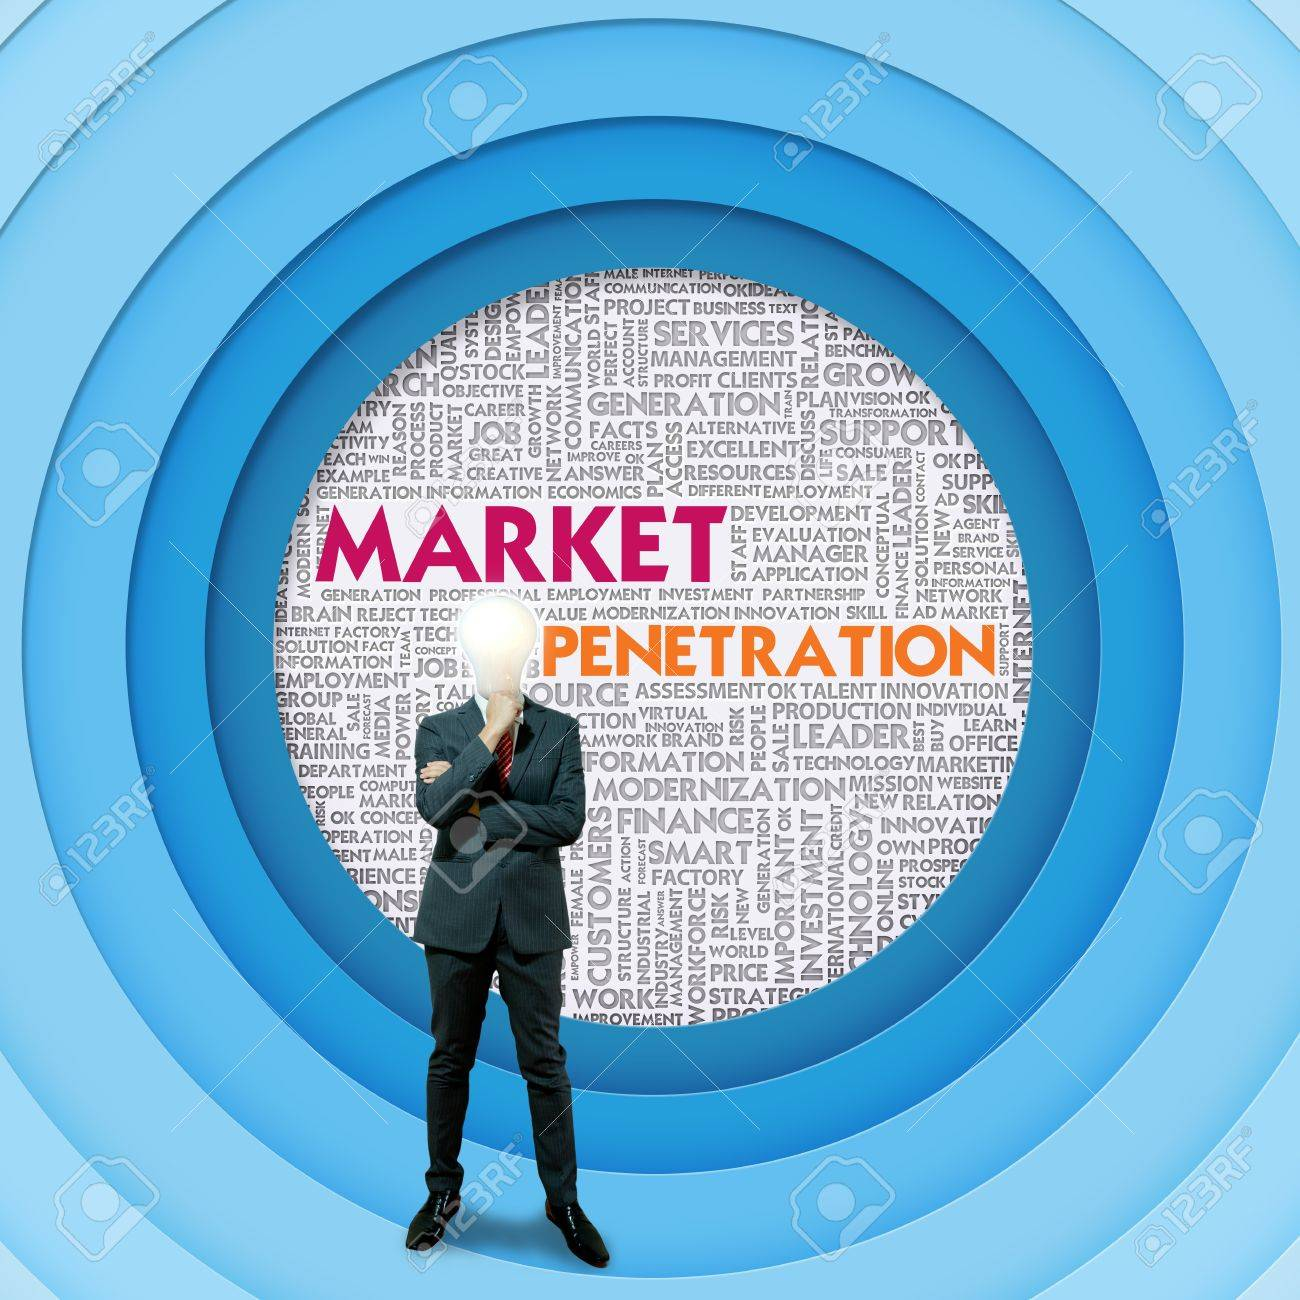 Business market penetration photo 507